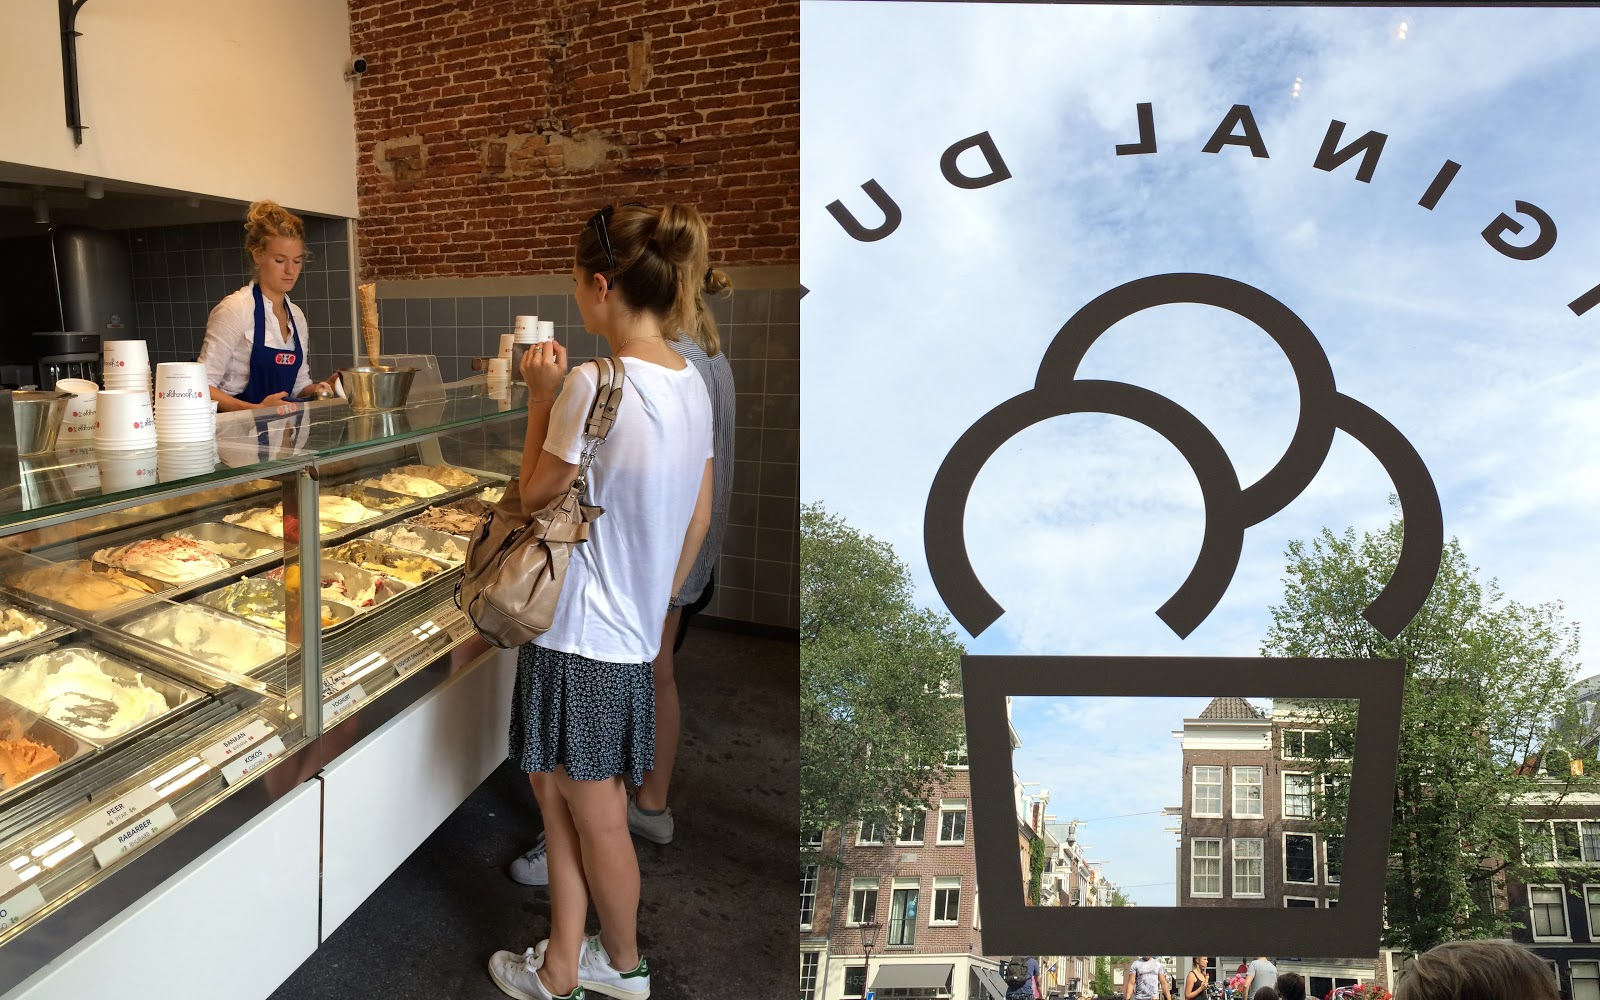 Ijscuypje Amsterdam Hotspot Guide